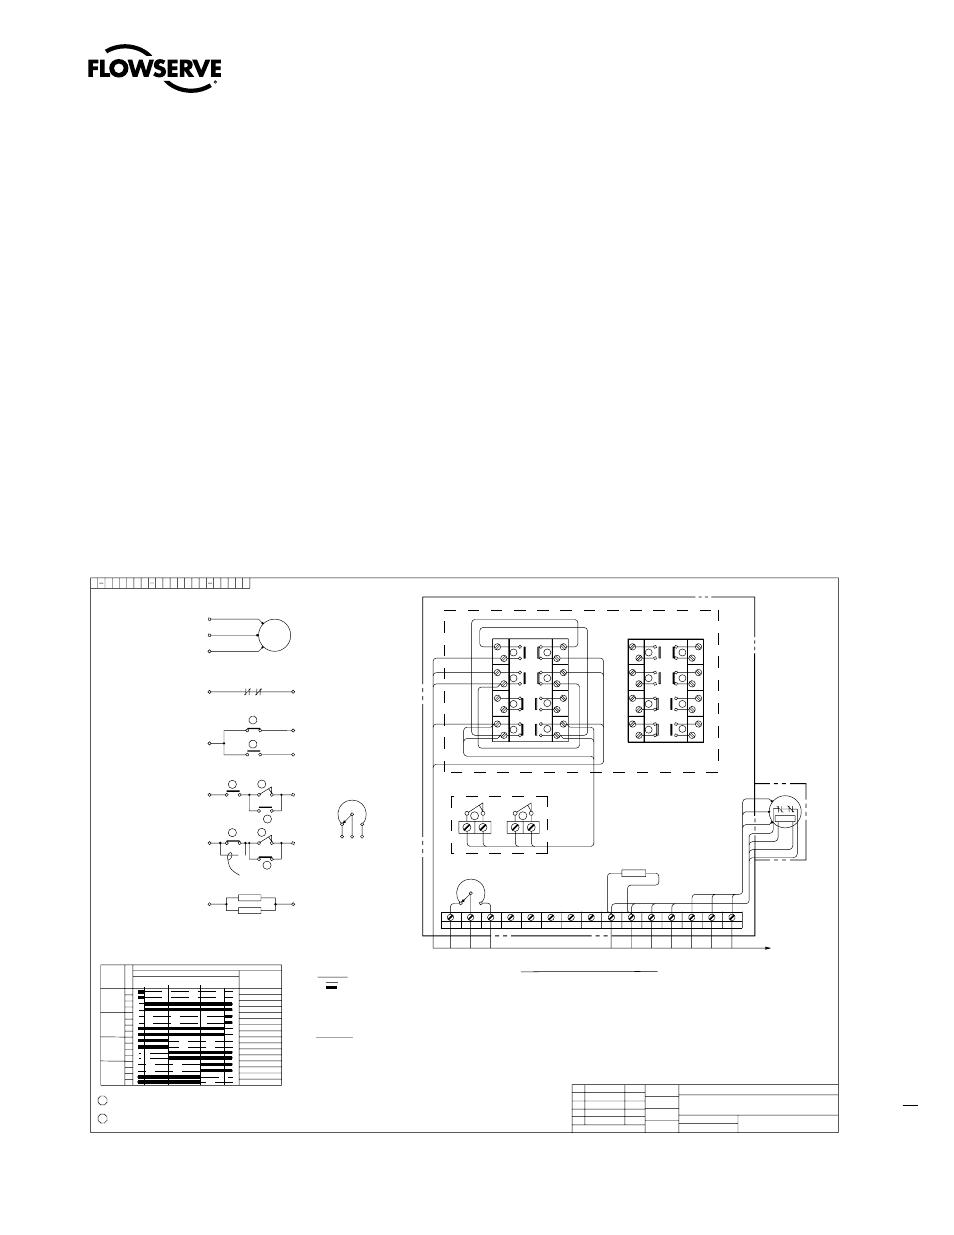 Standard wiring diagrams, 49 limitorque, Figure 9.1